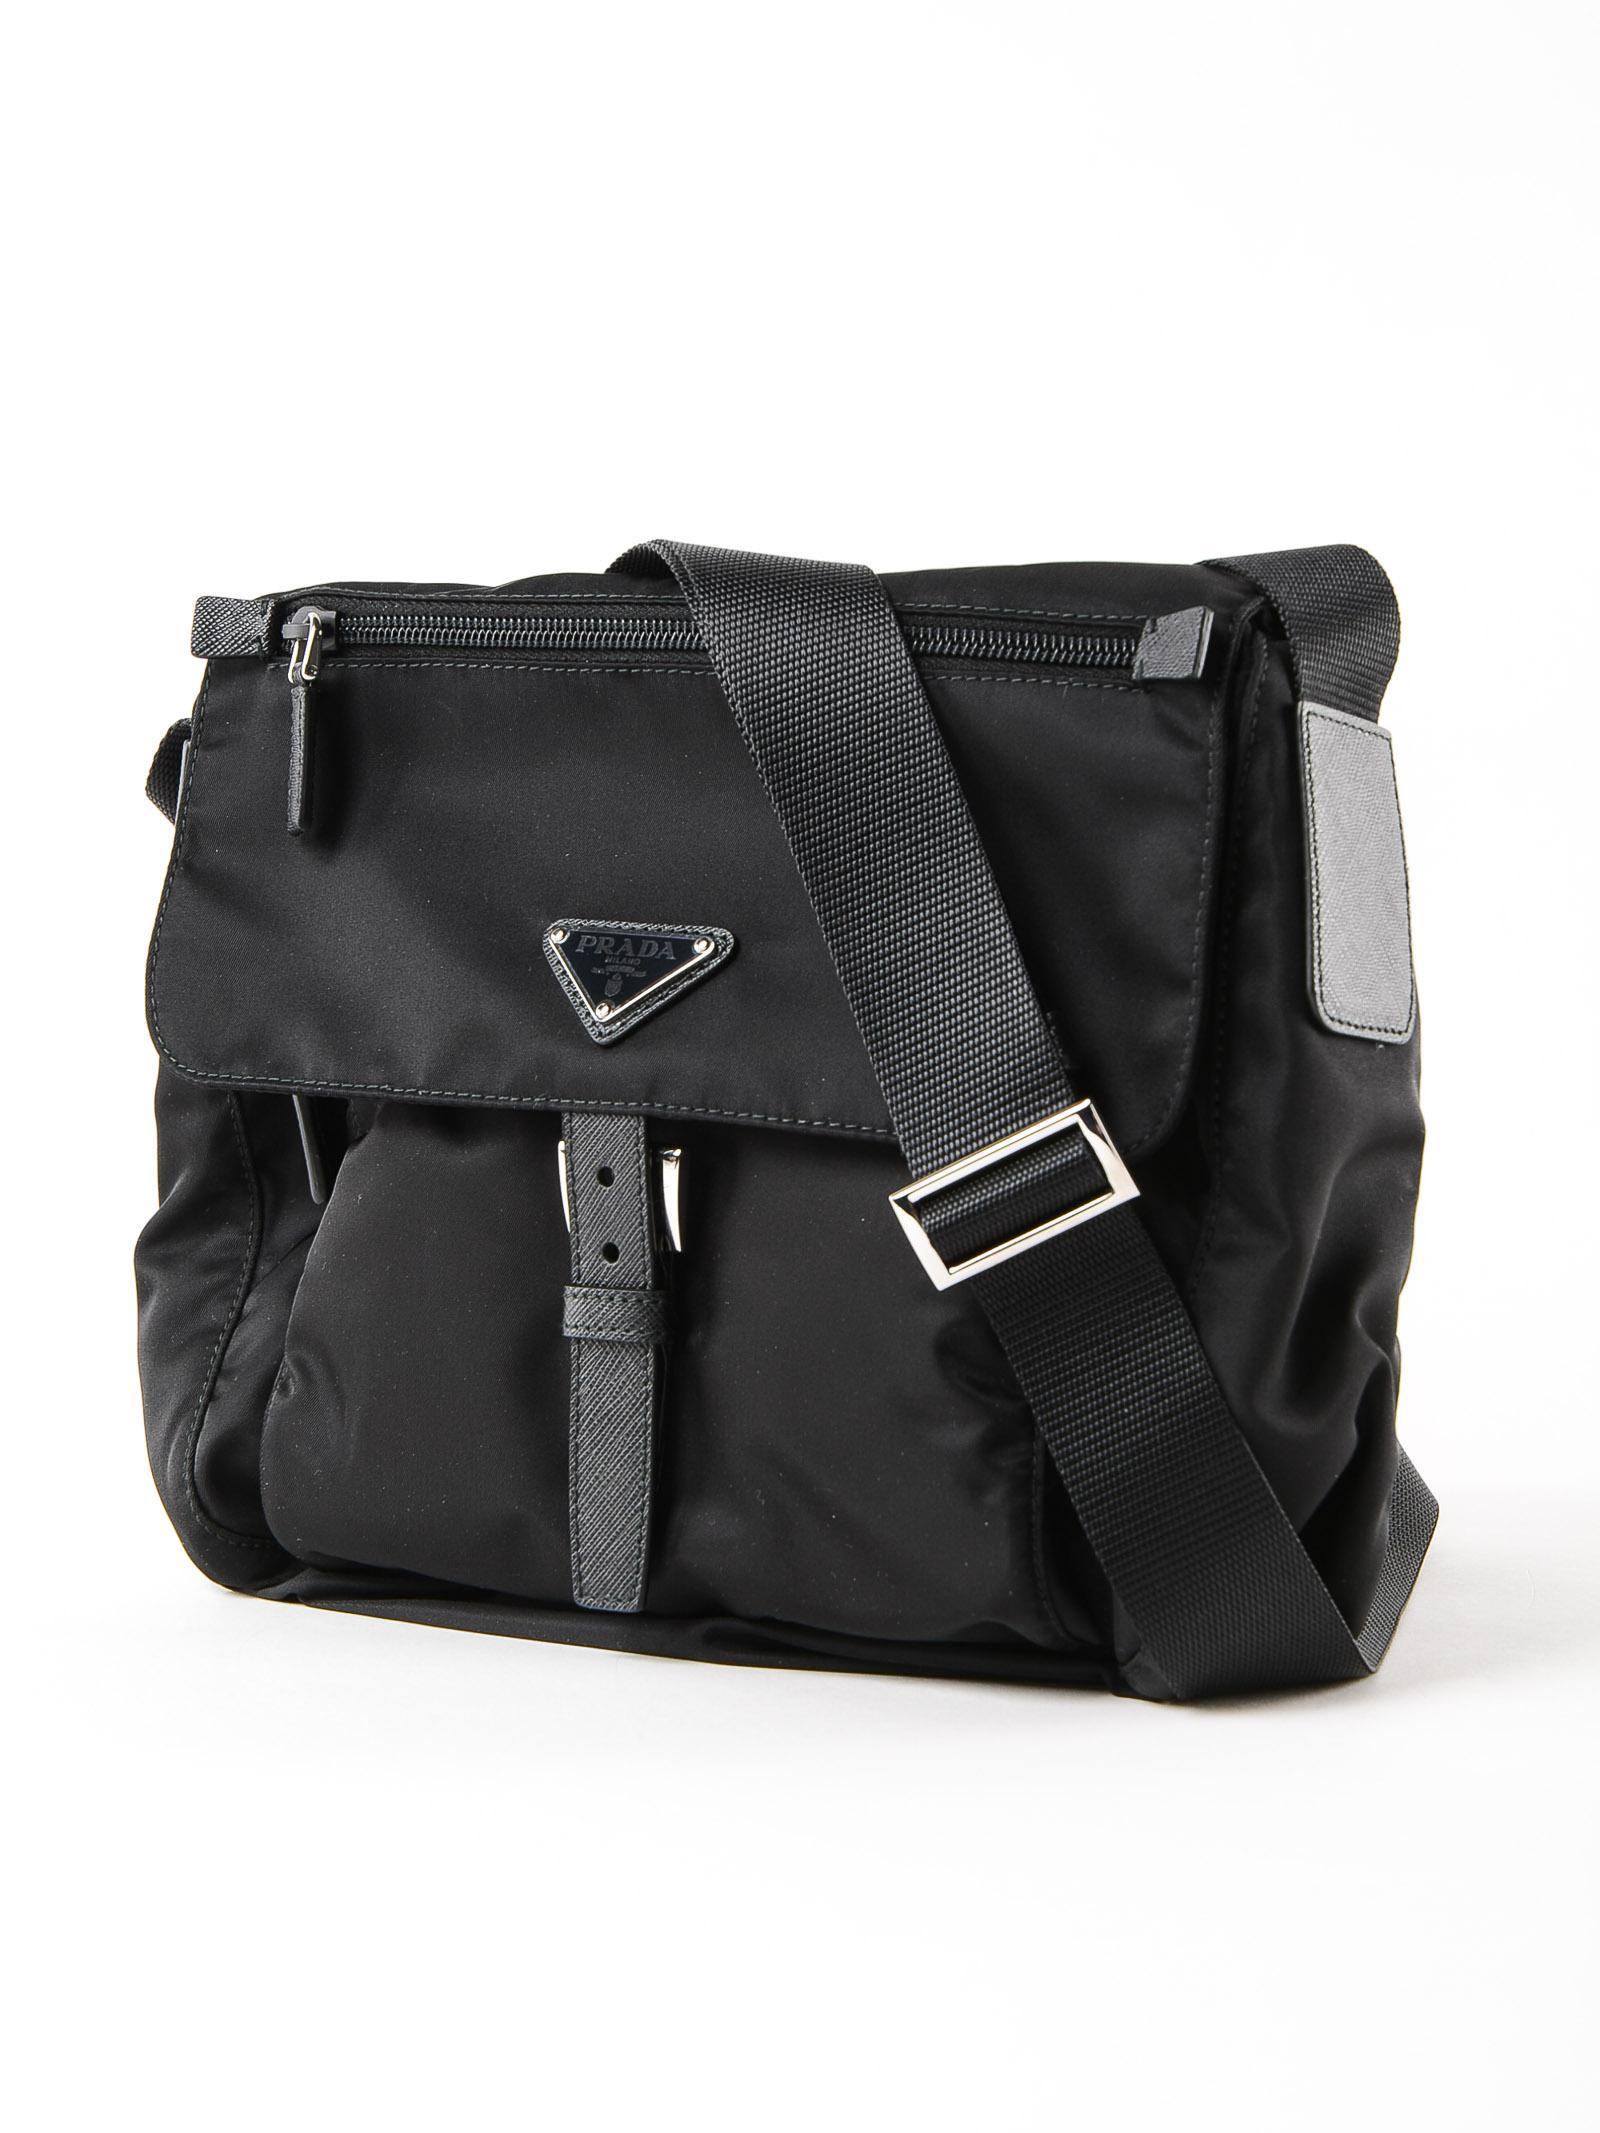 844bfa1fbfc9 Prada Shoulder Bag Vela in Black - Lyst